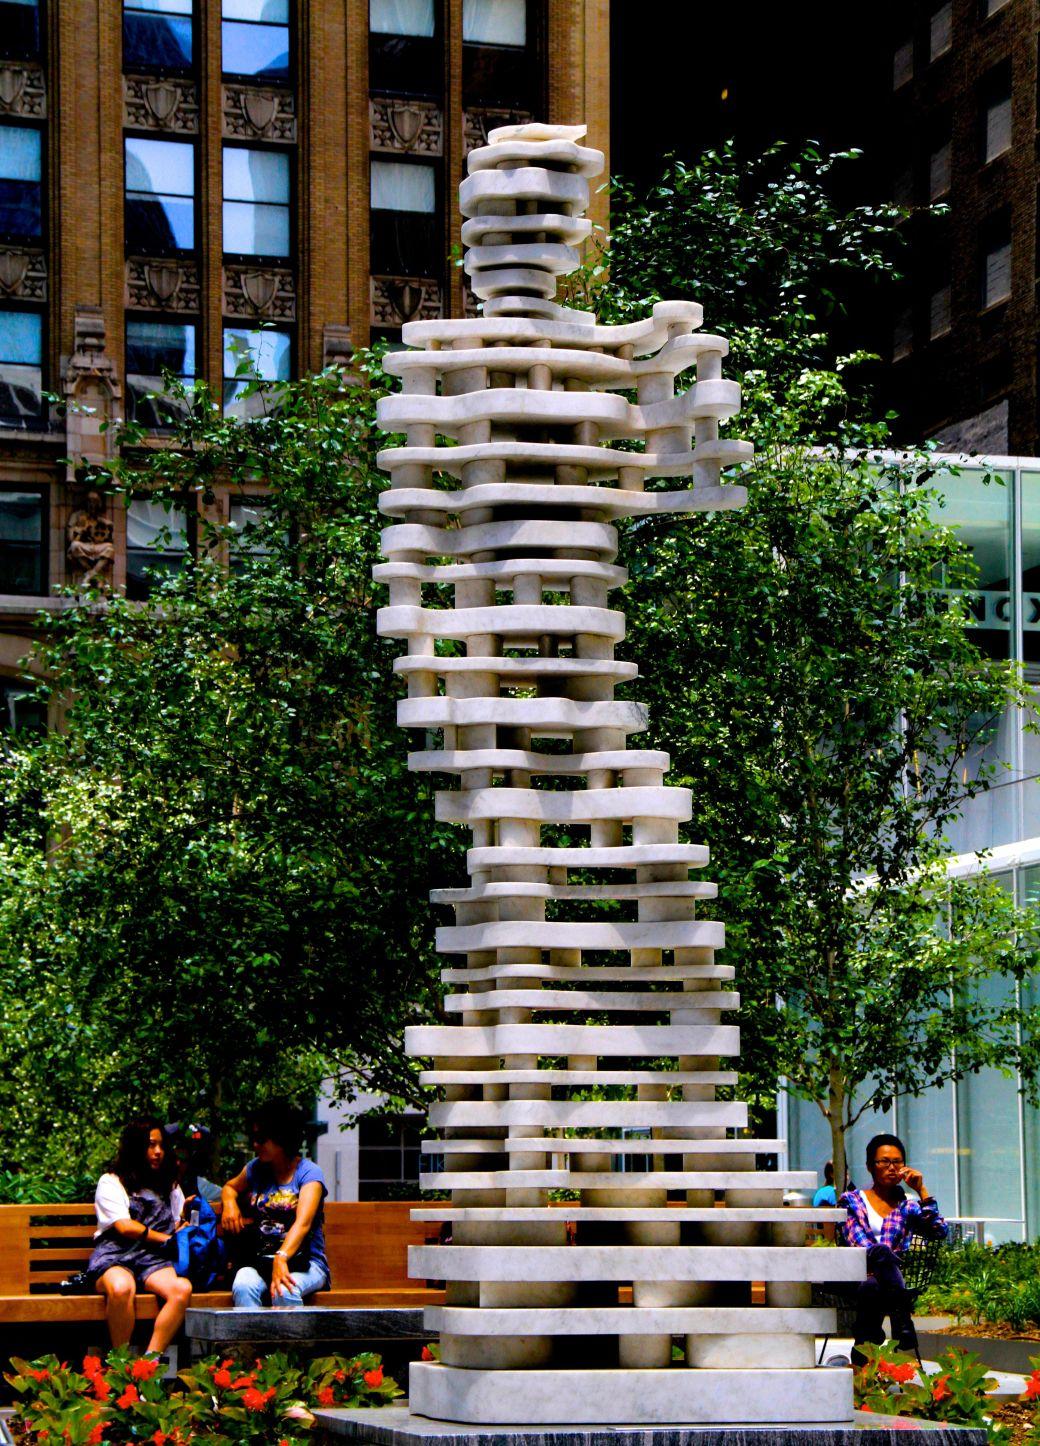 new york city public art david chopped up